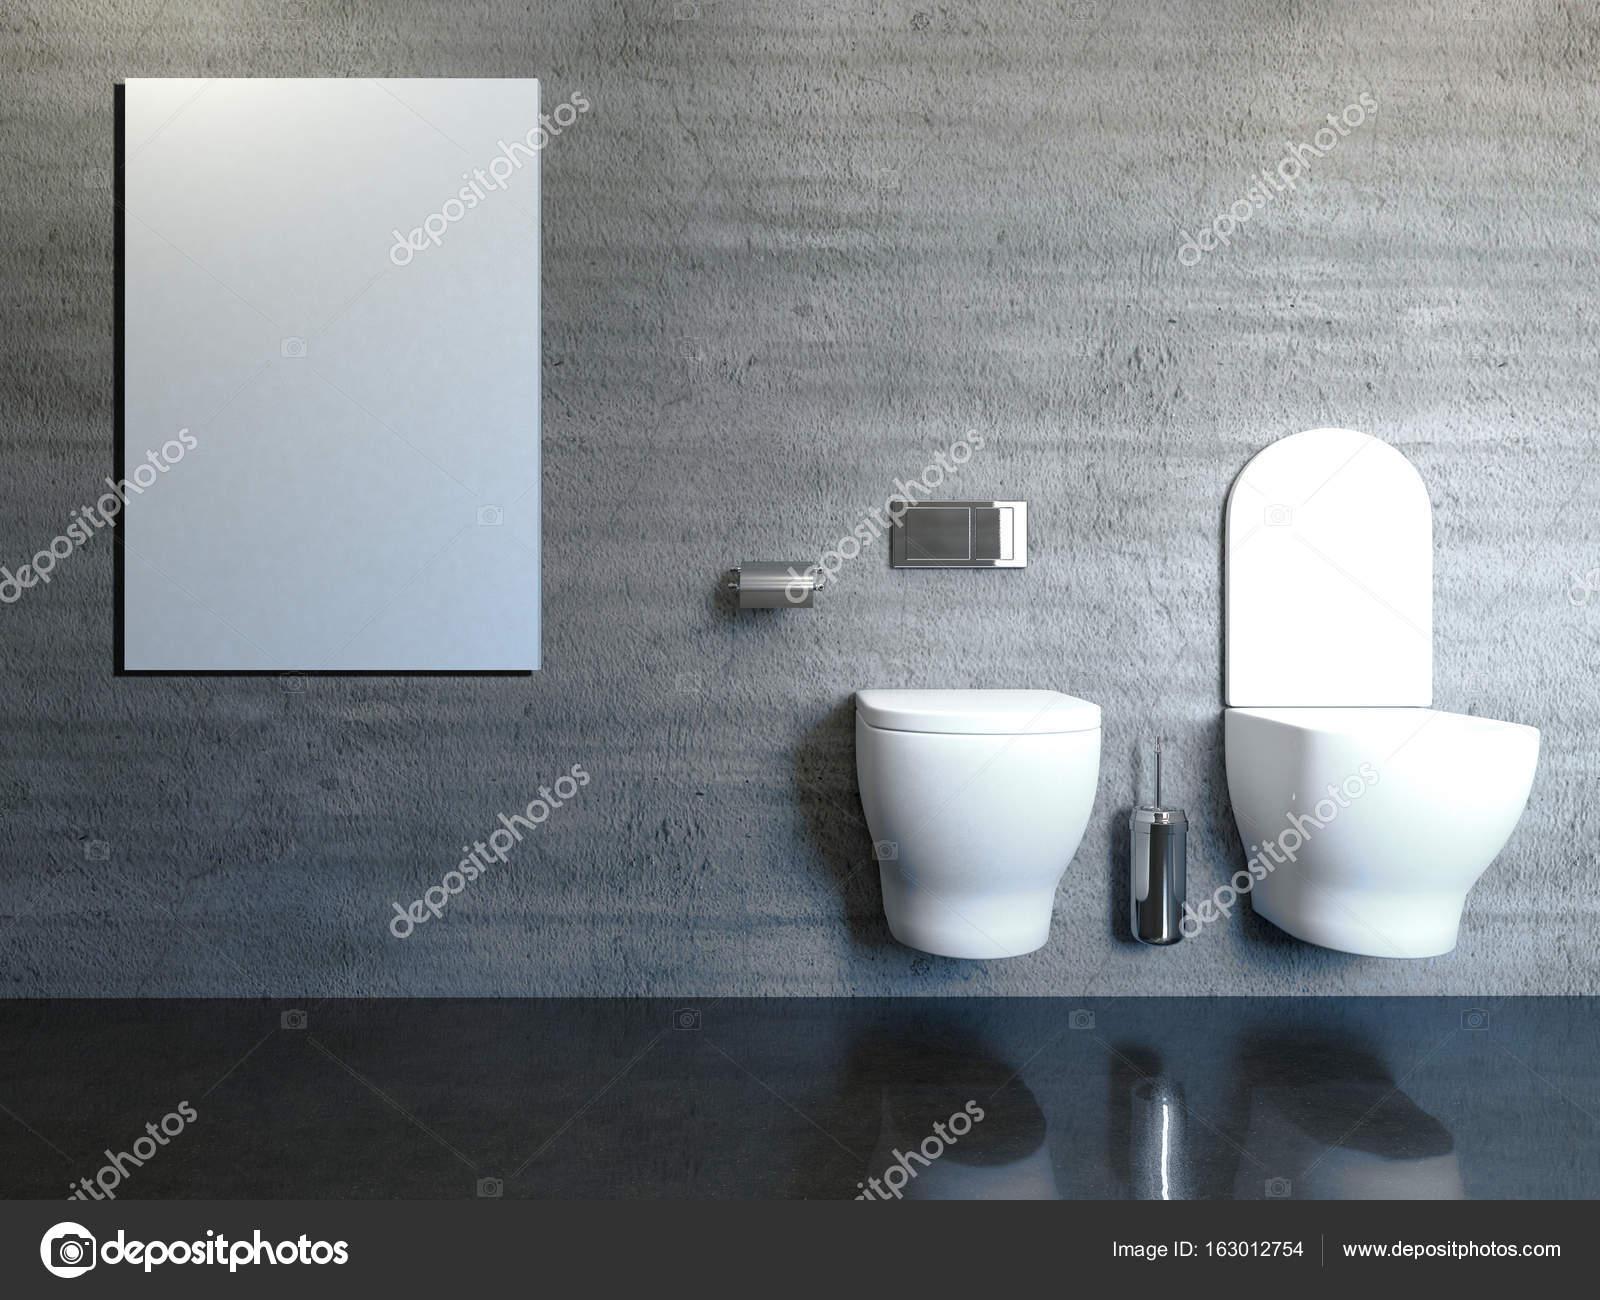 Betonnen Badkamer Muur : Moderne badkamer met betonnen muur d rendering u stockfoto